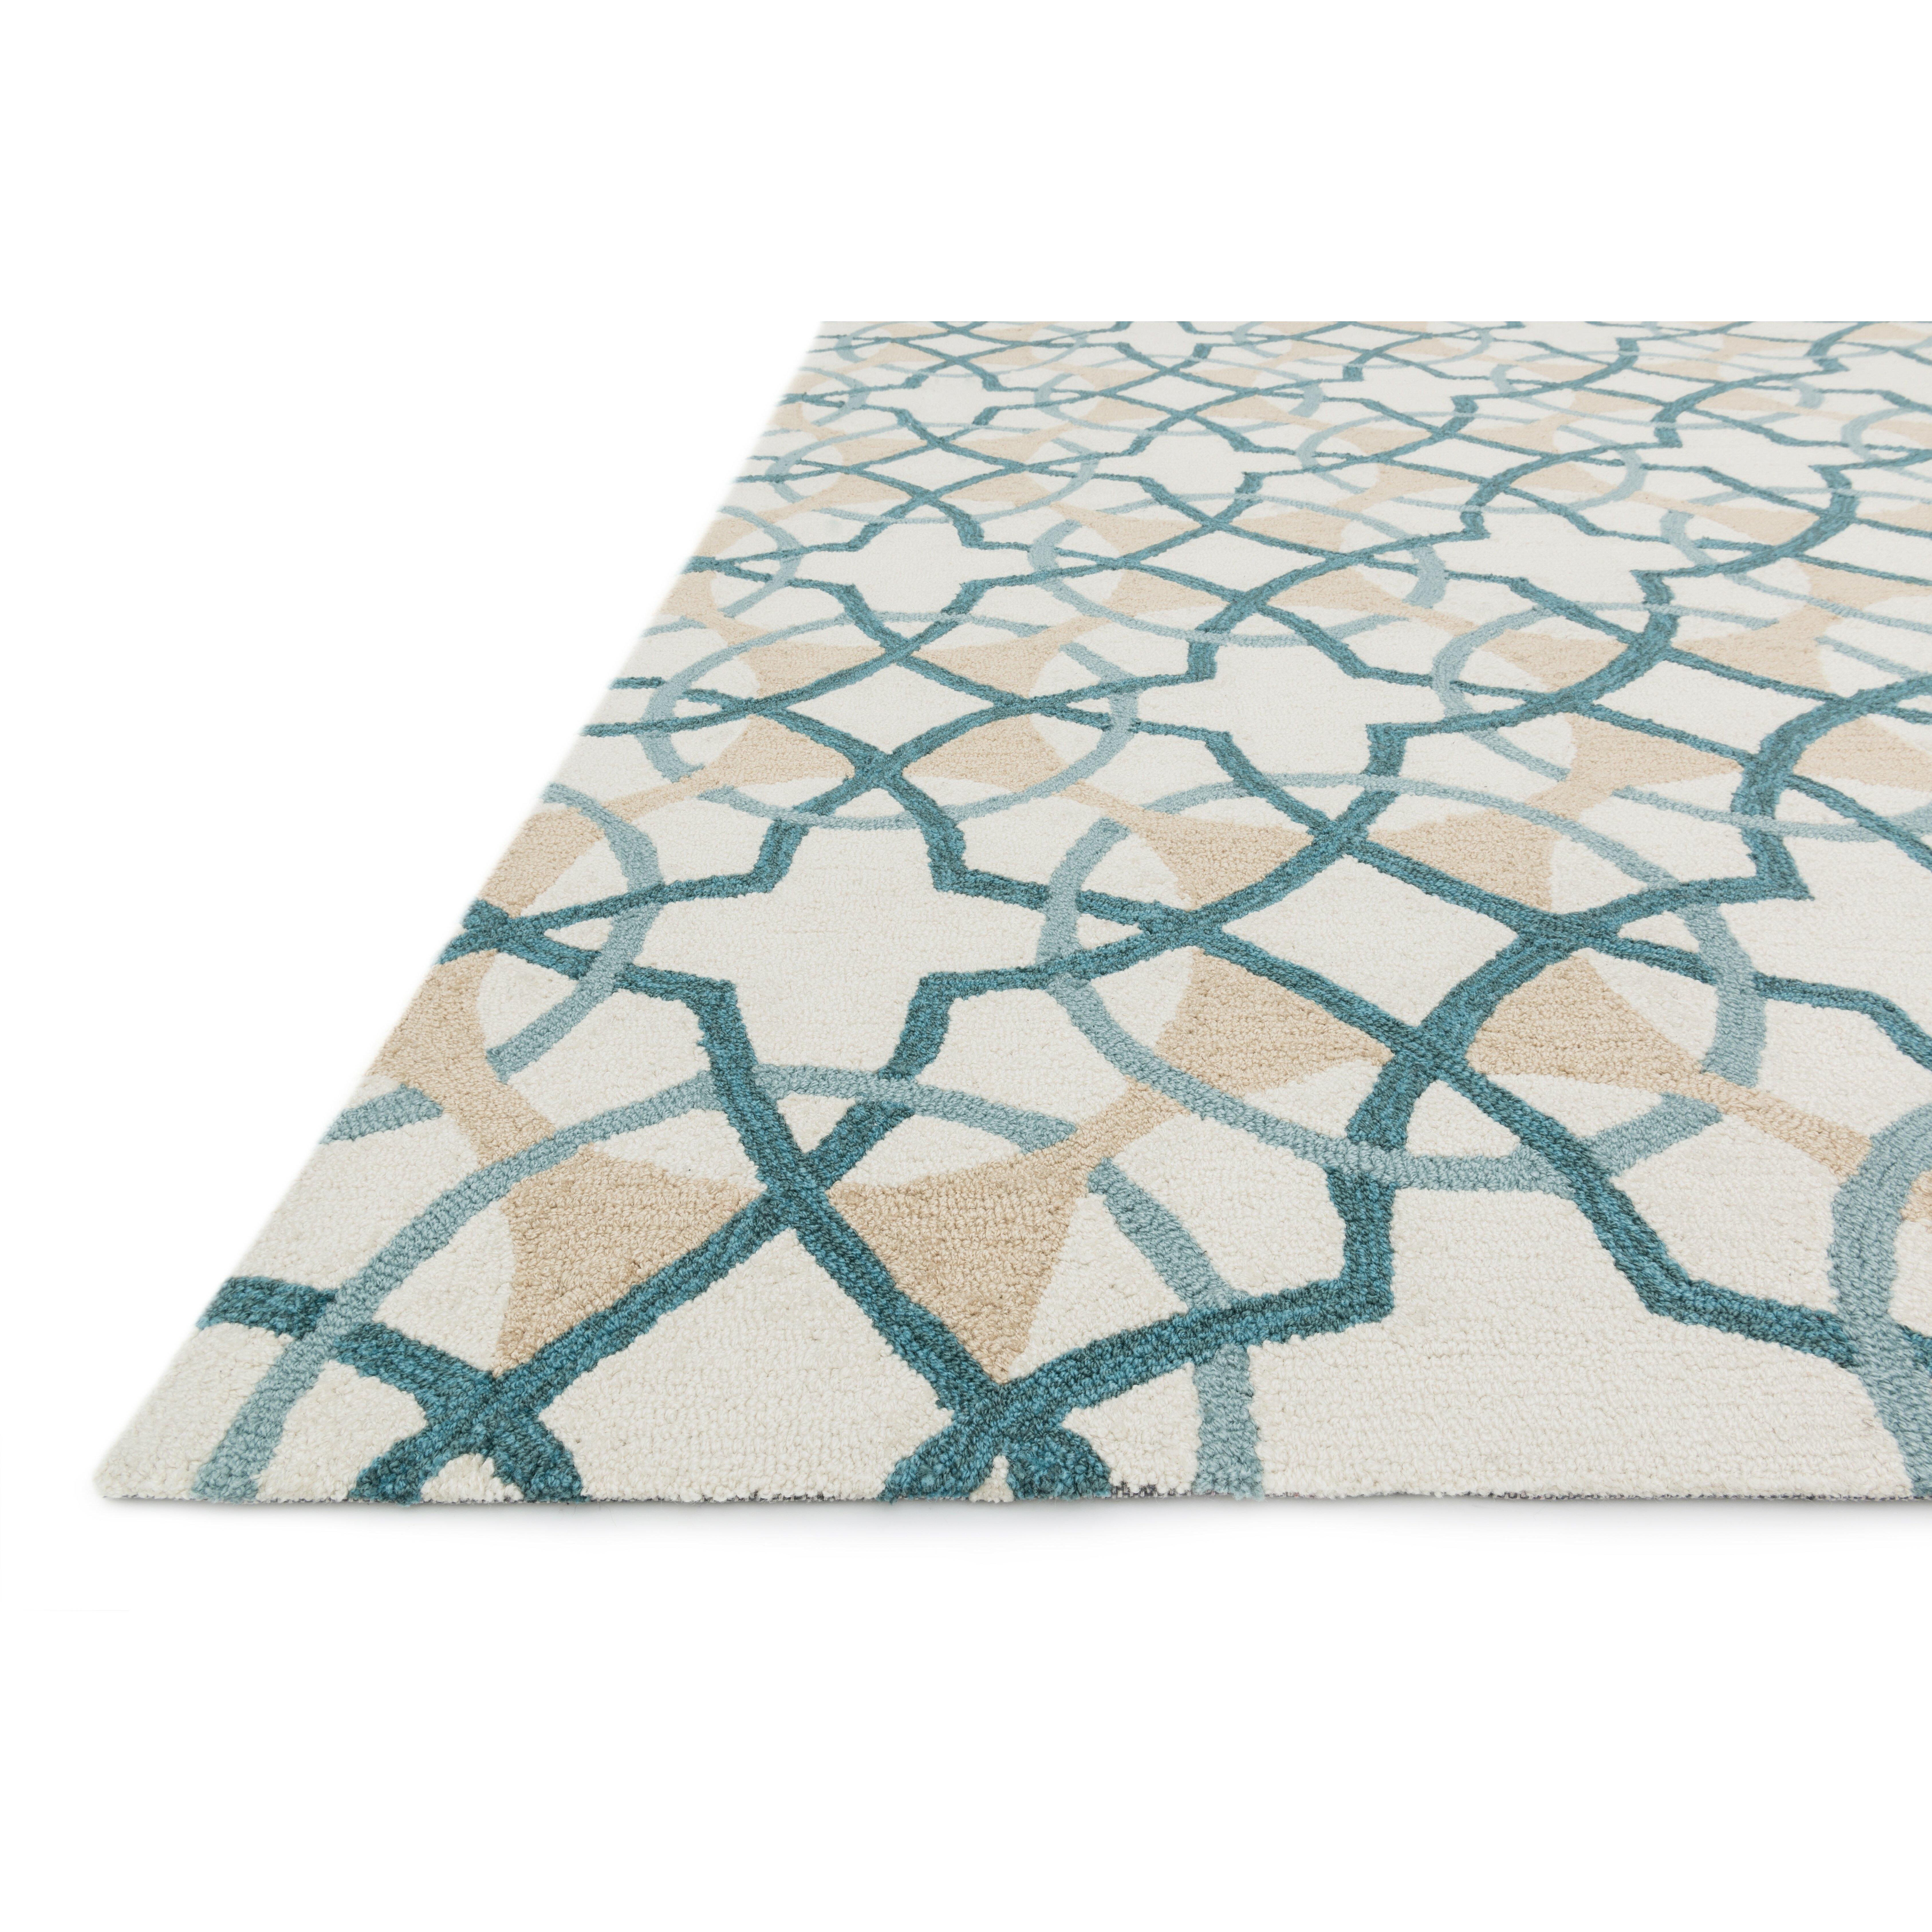 Loloi Rugs Francesca Ivory/Teal Geometric Area Rug